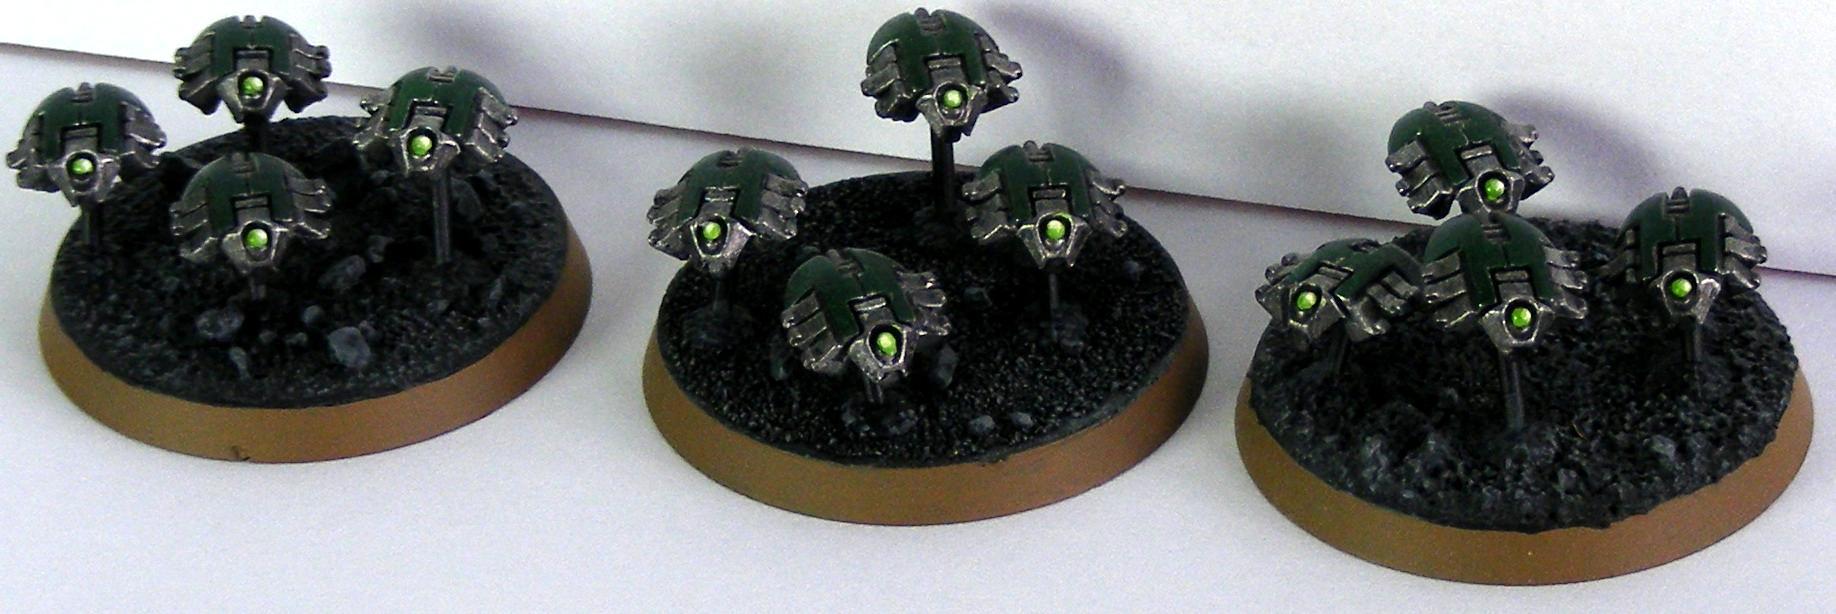 Canoptek, Necrons, Scarabs, Warhammer 40,000